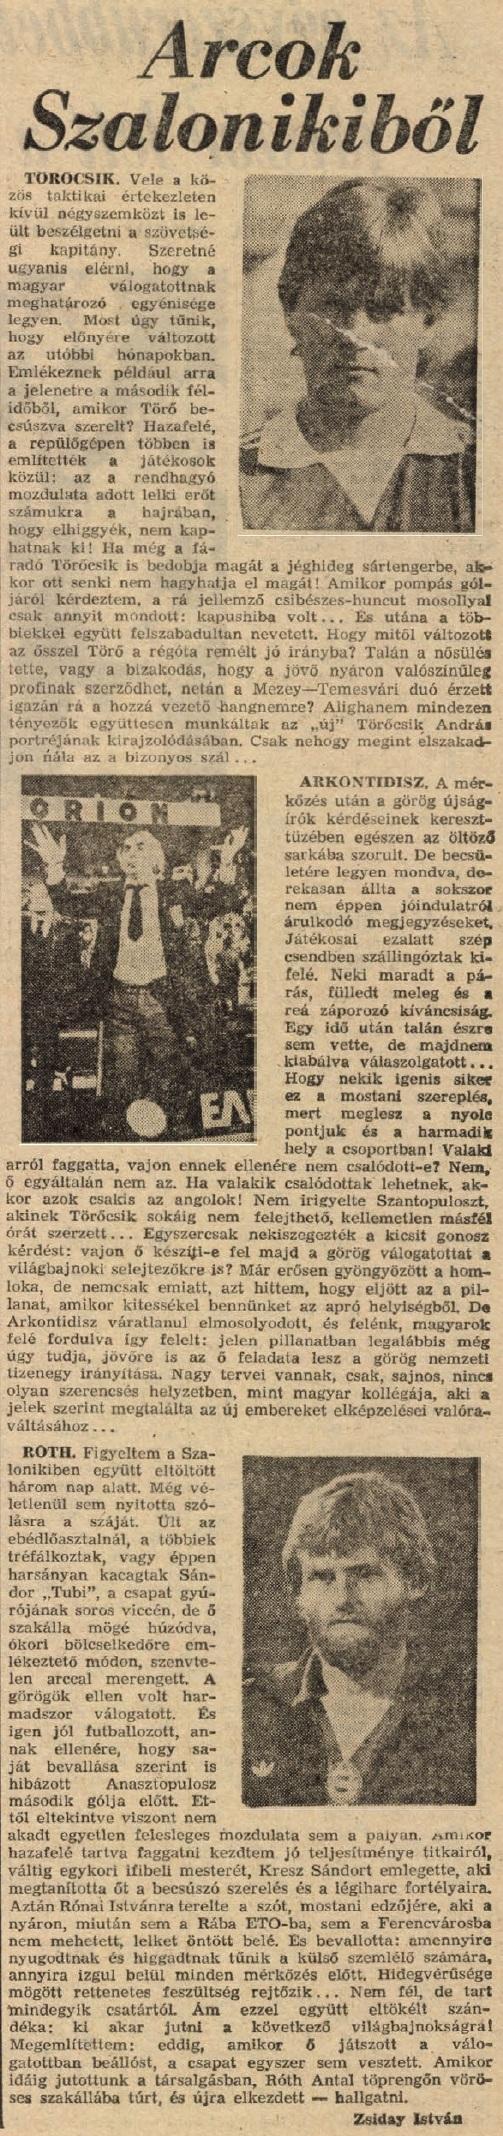 idokapszula_nb_i_1983_84_gorogorszag_magyarorszag_eb-selejtezo_merkozes_3.jpg